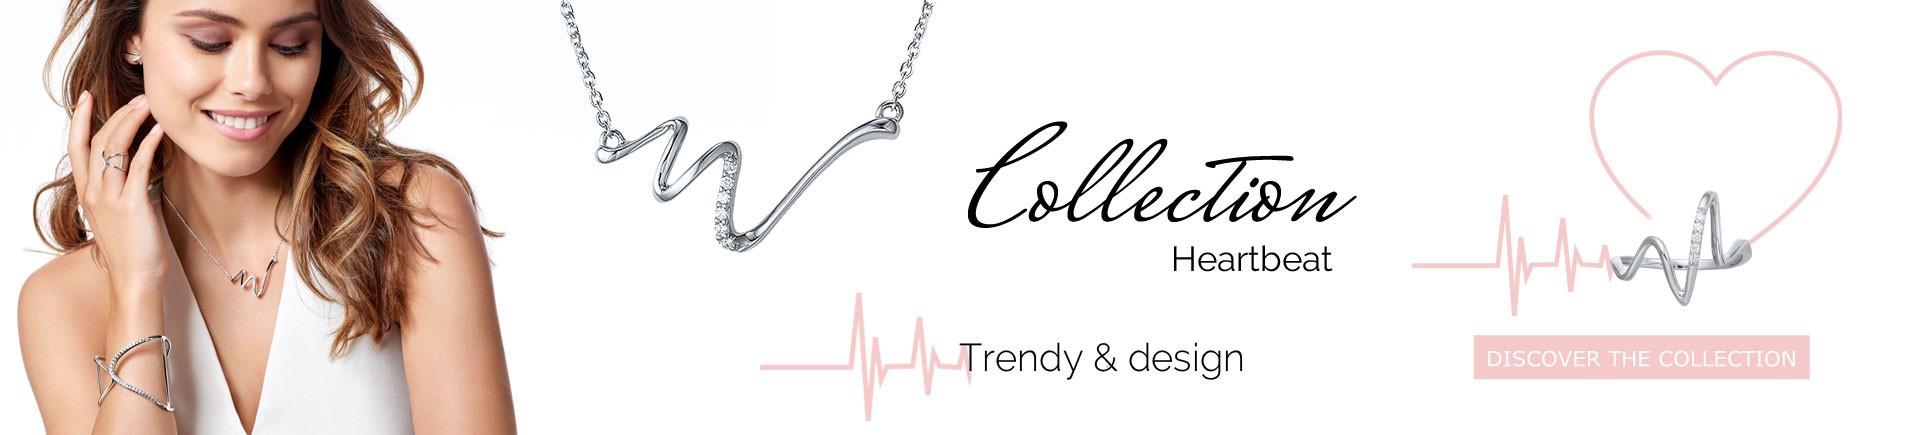 Design & trendy